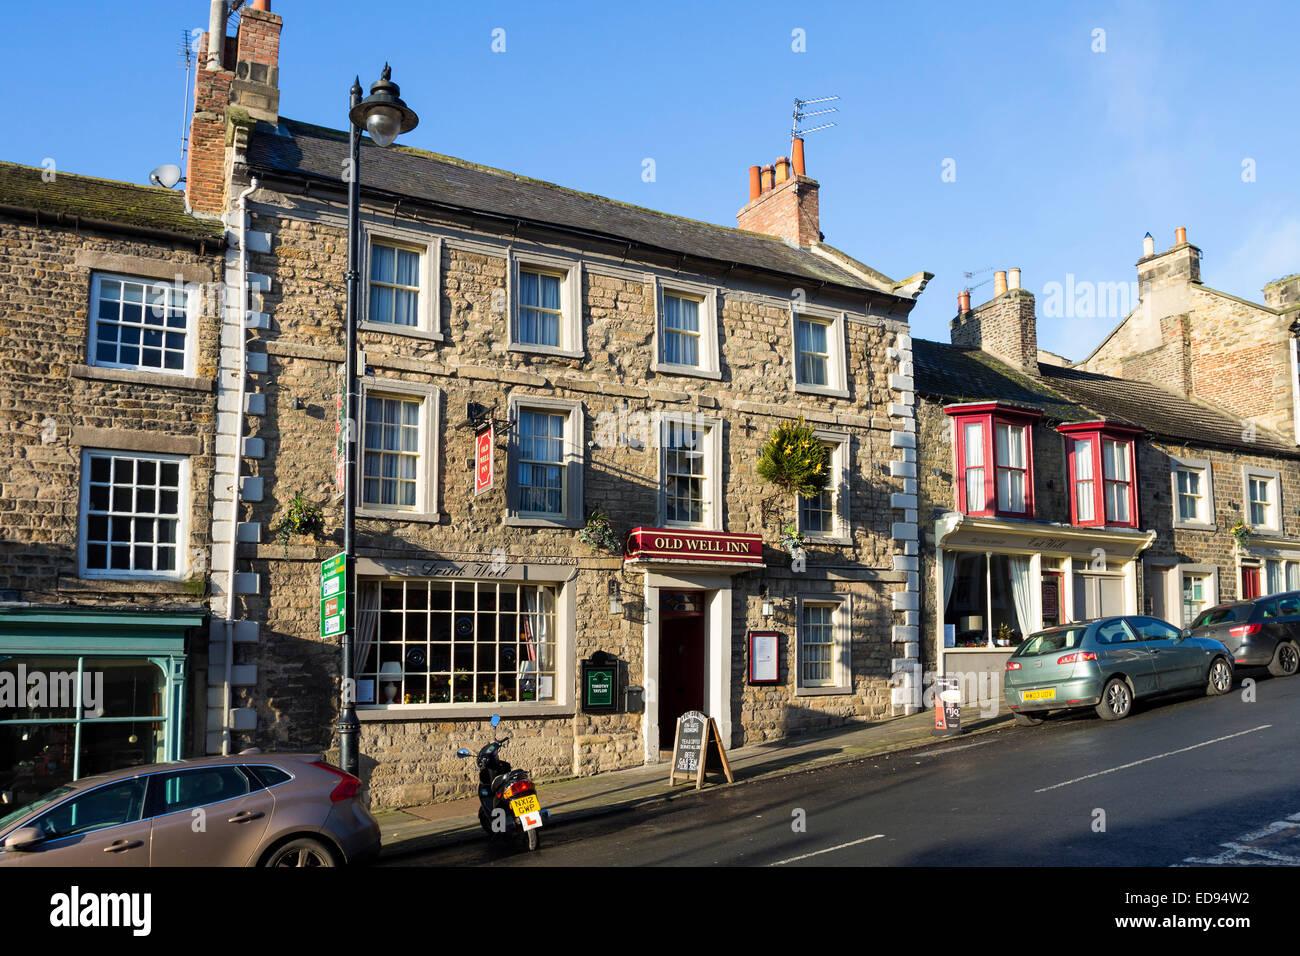 The Old Well Inn on the Bank, Barnard Castle County Durham UK - Stock Image